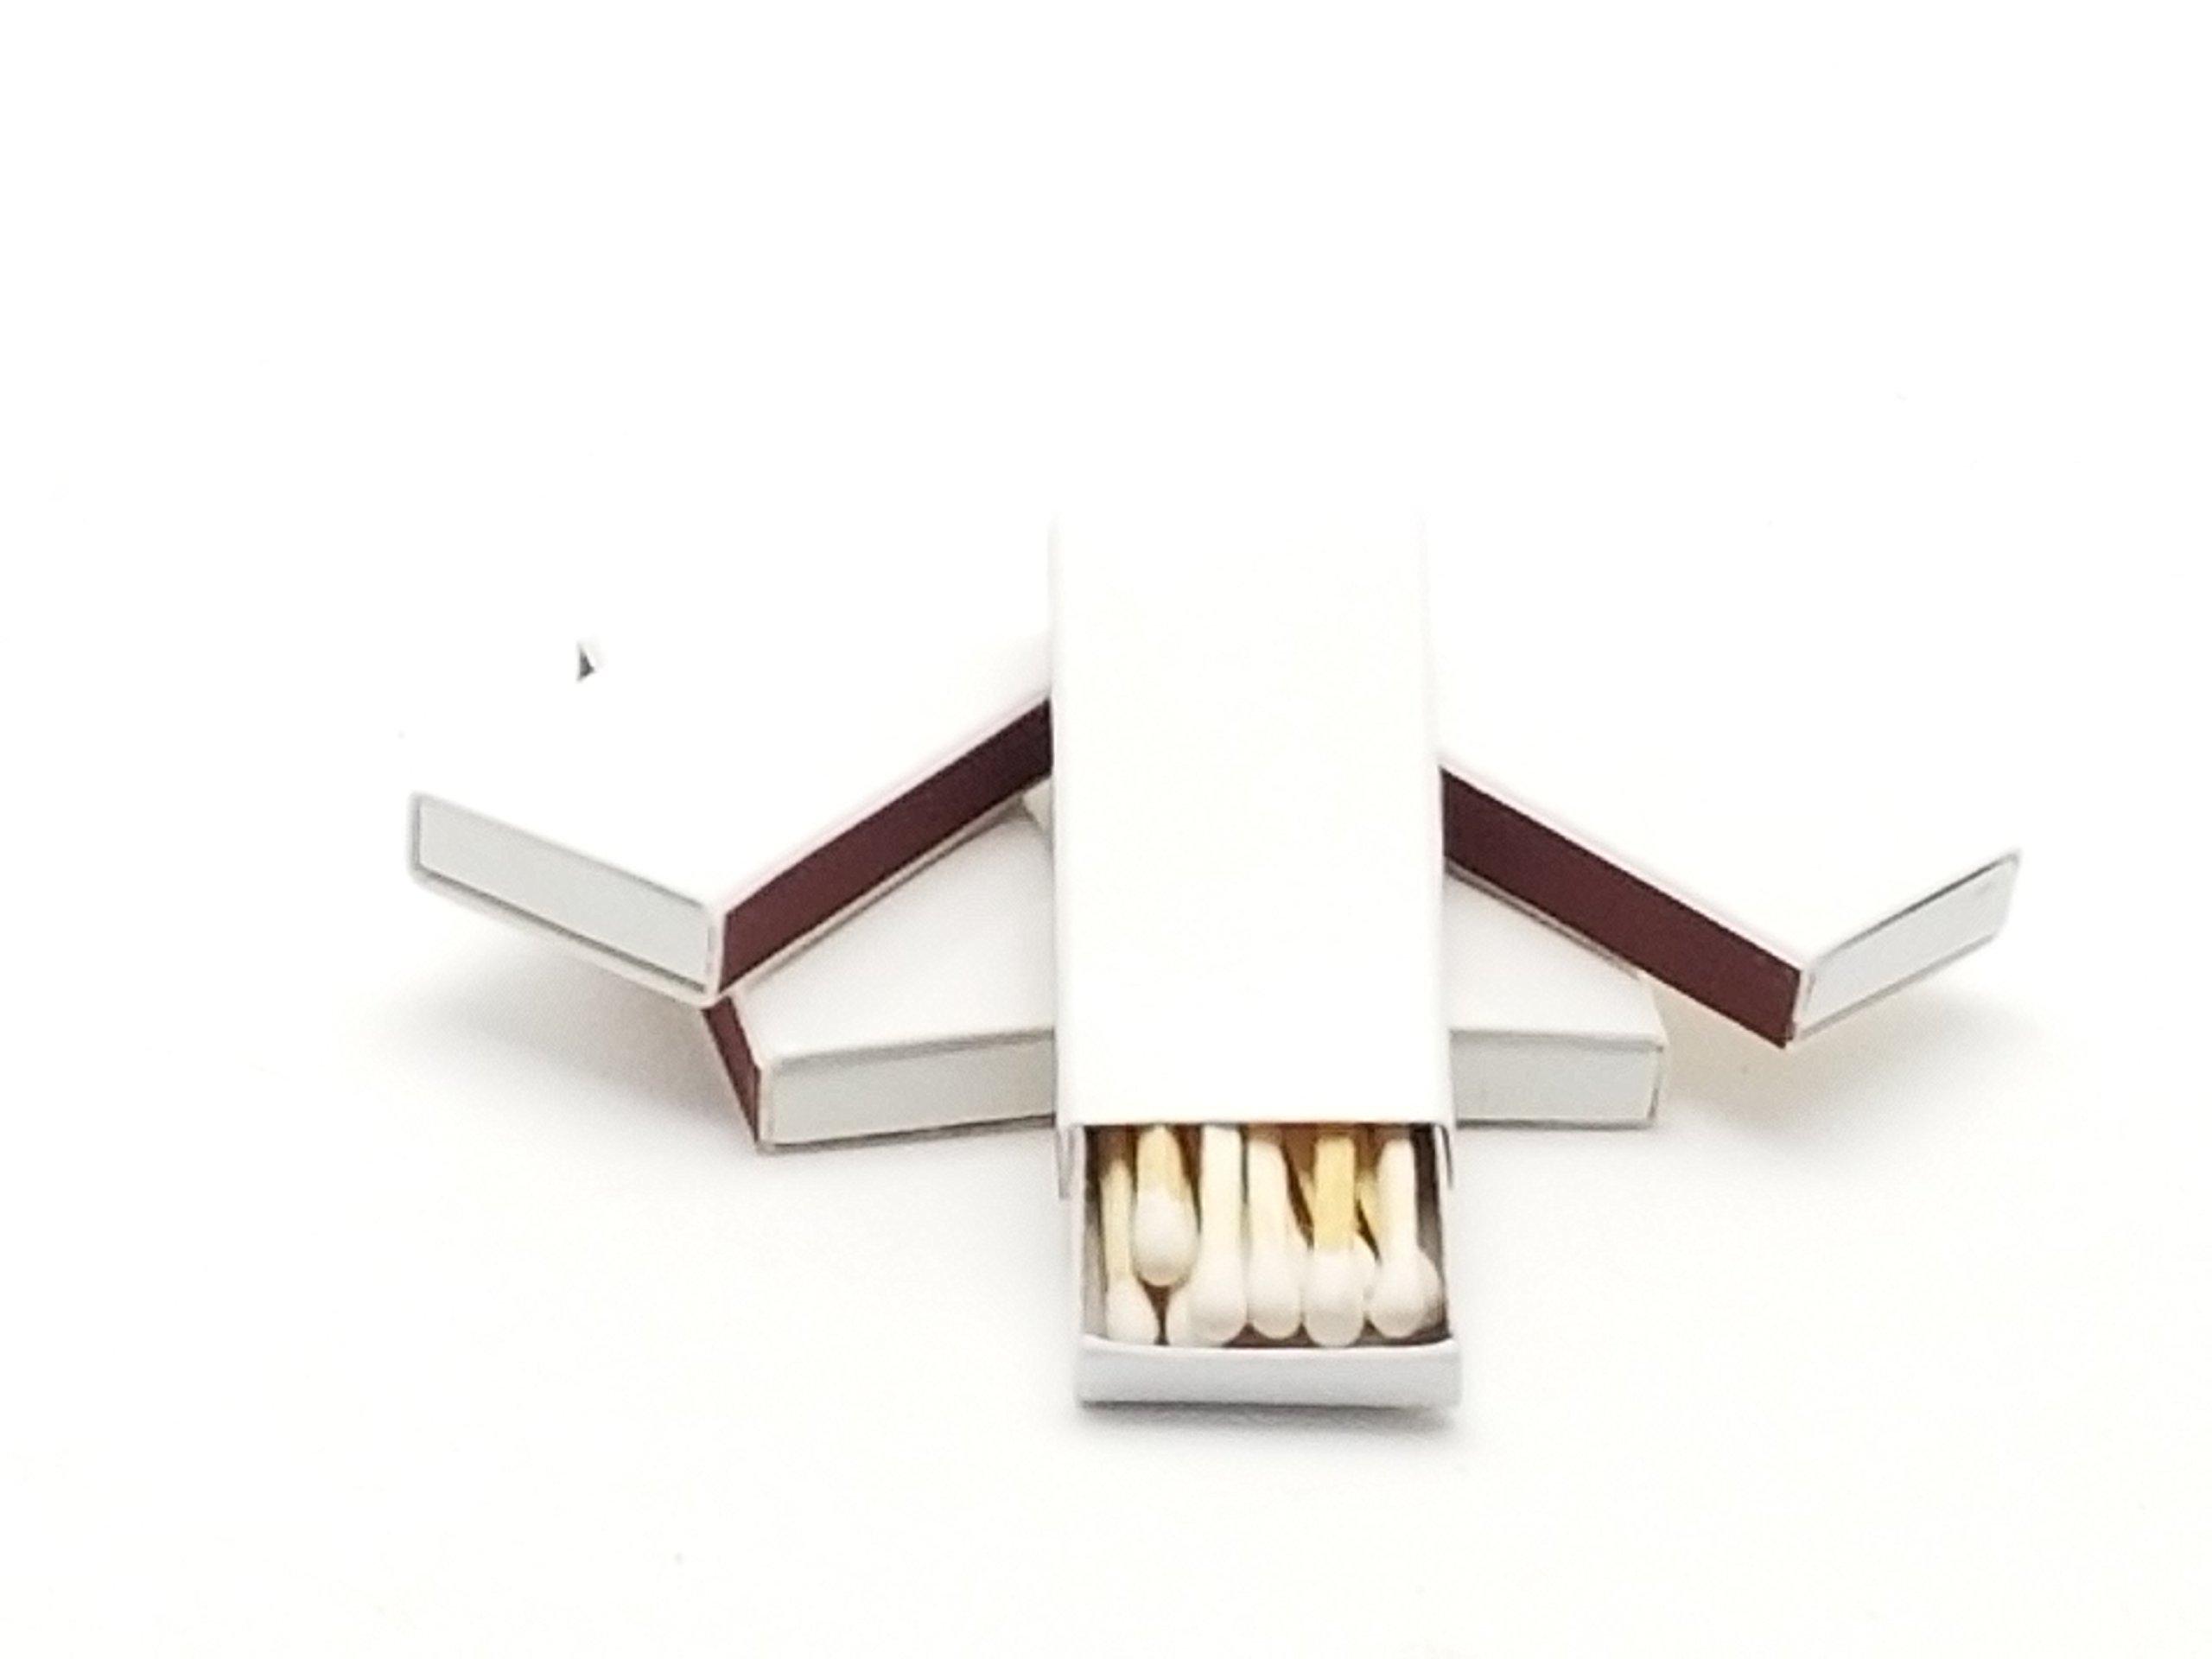 50 Miniature Plain White Cover Wooden Matches Box Matches